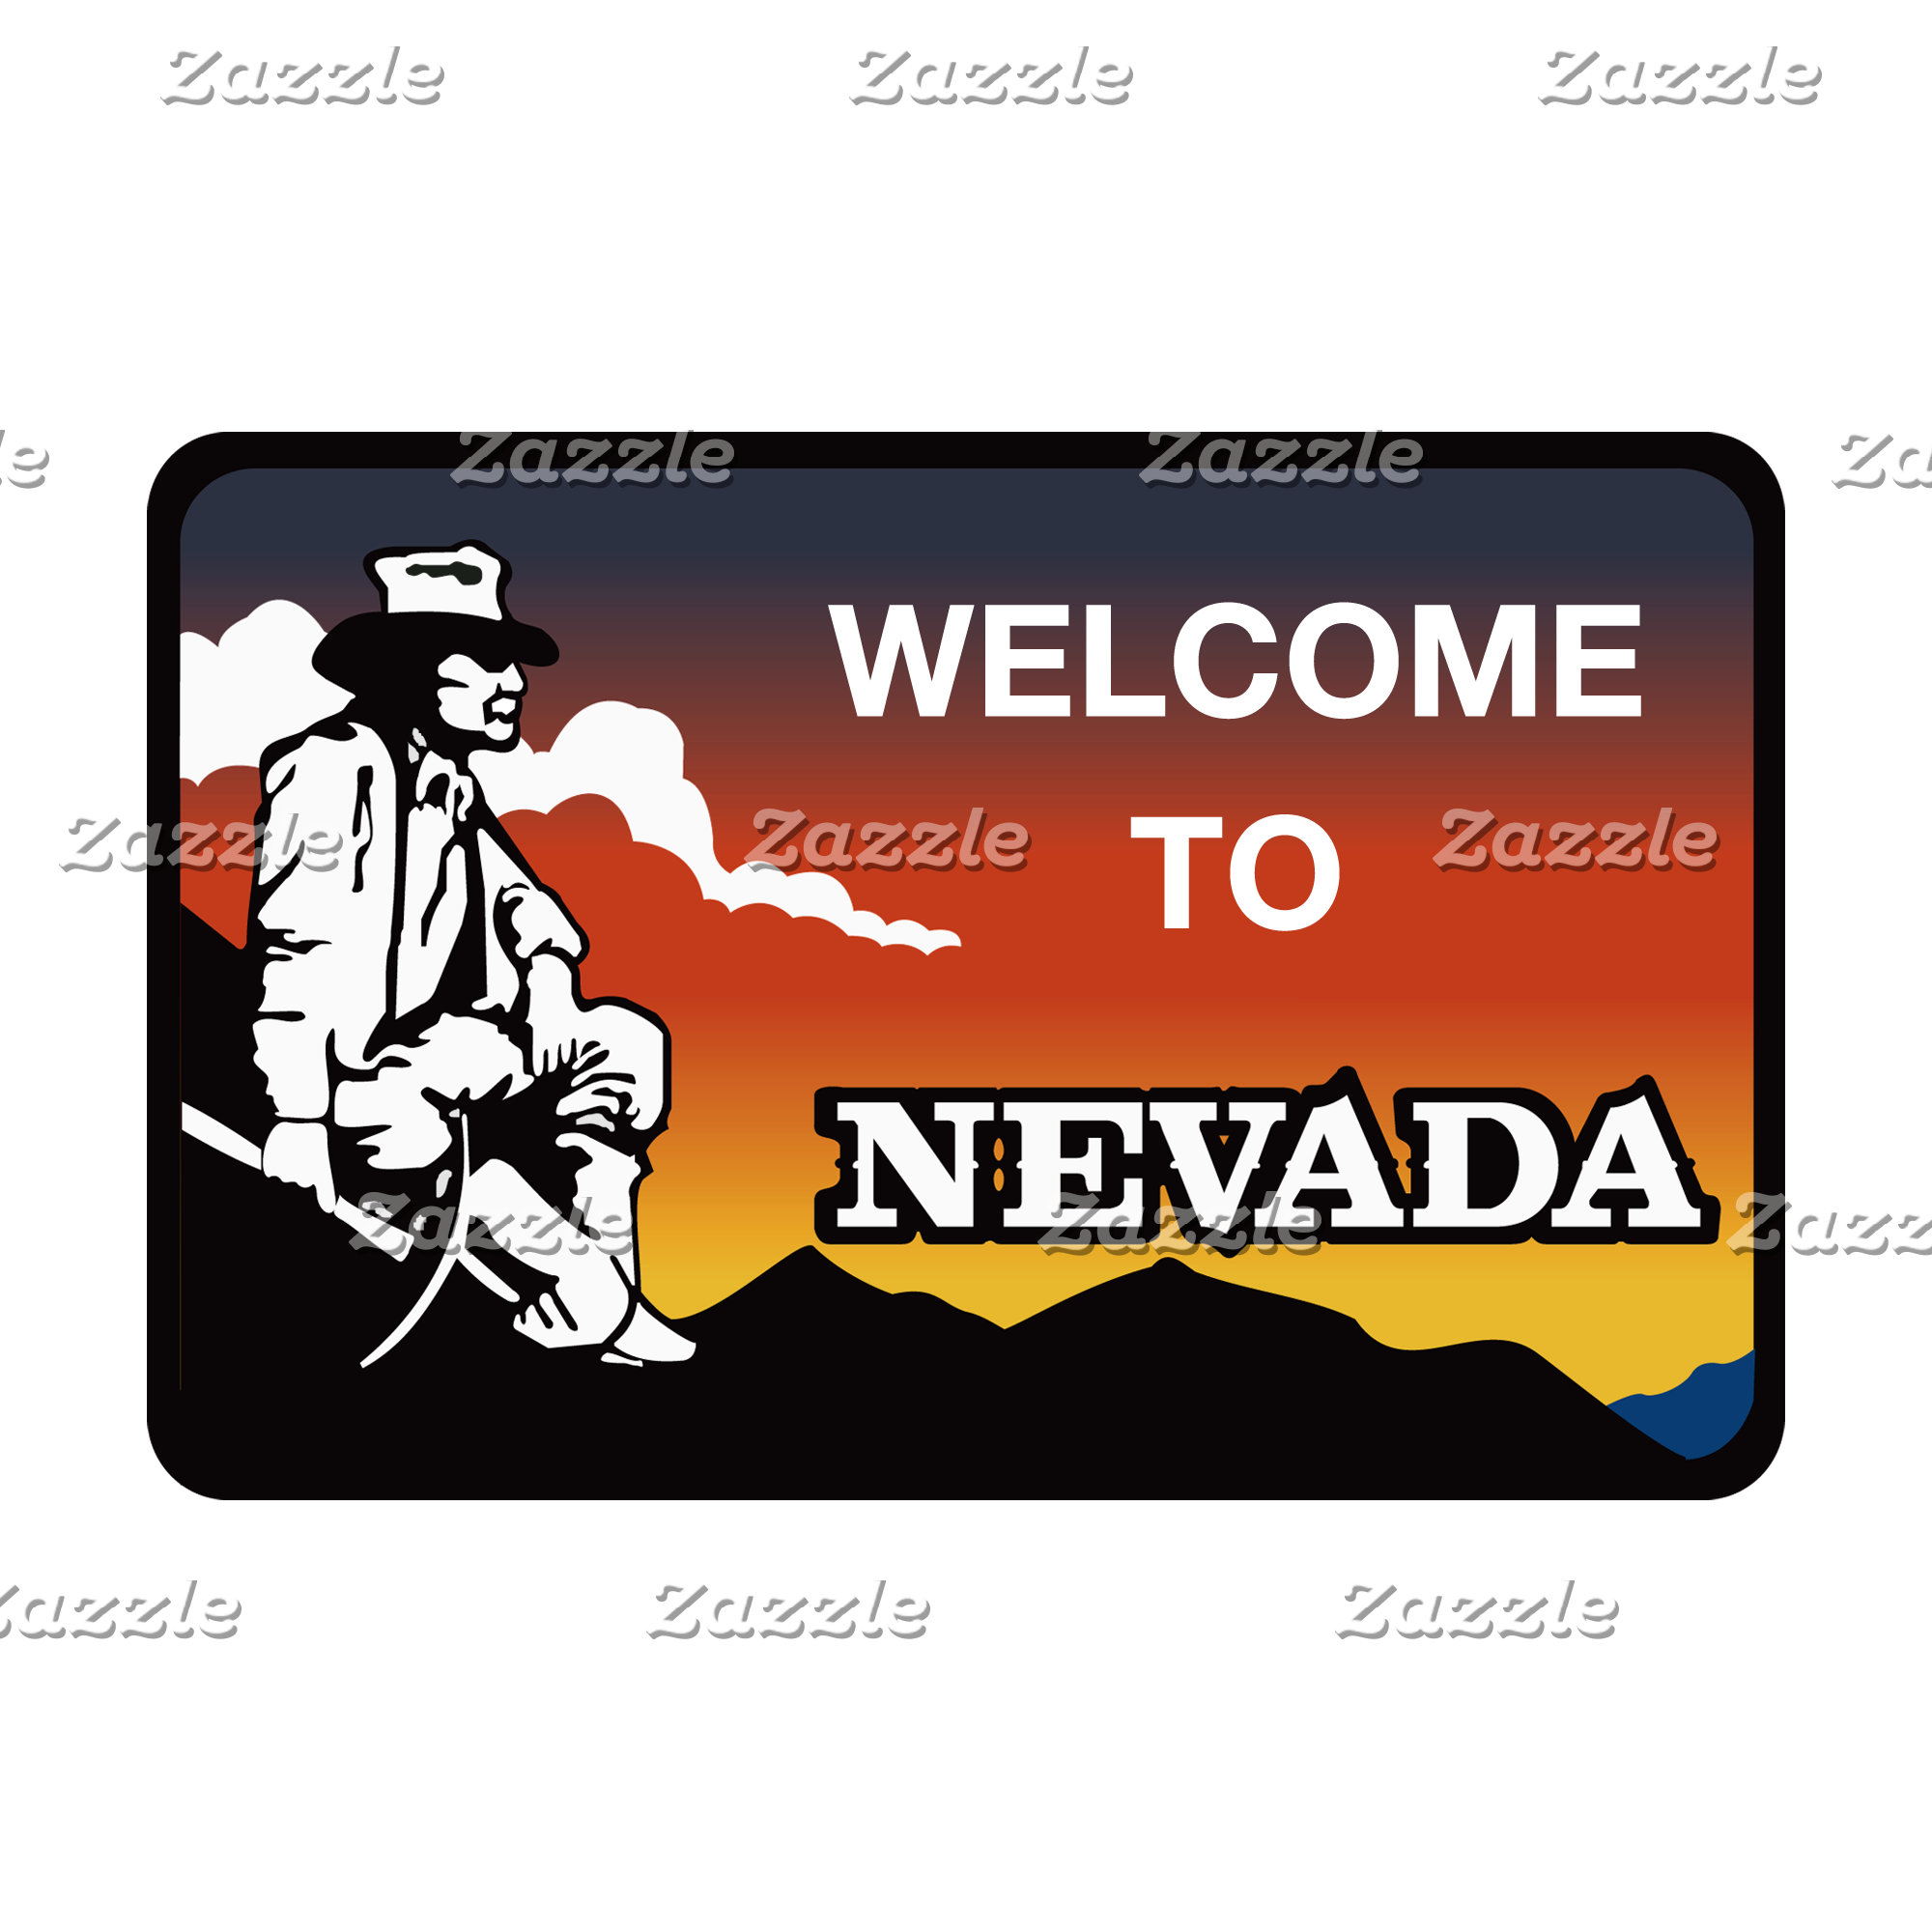 + Welcome to USA